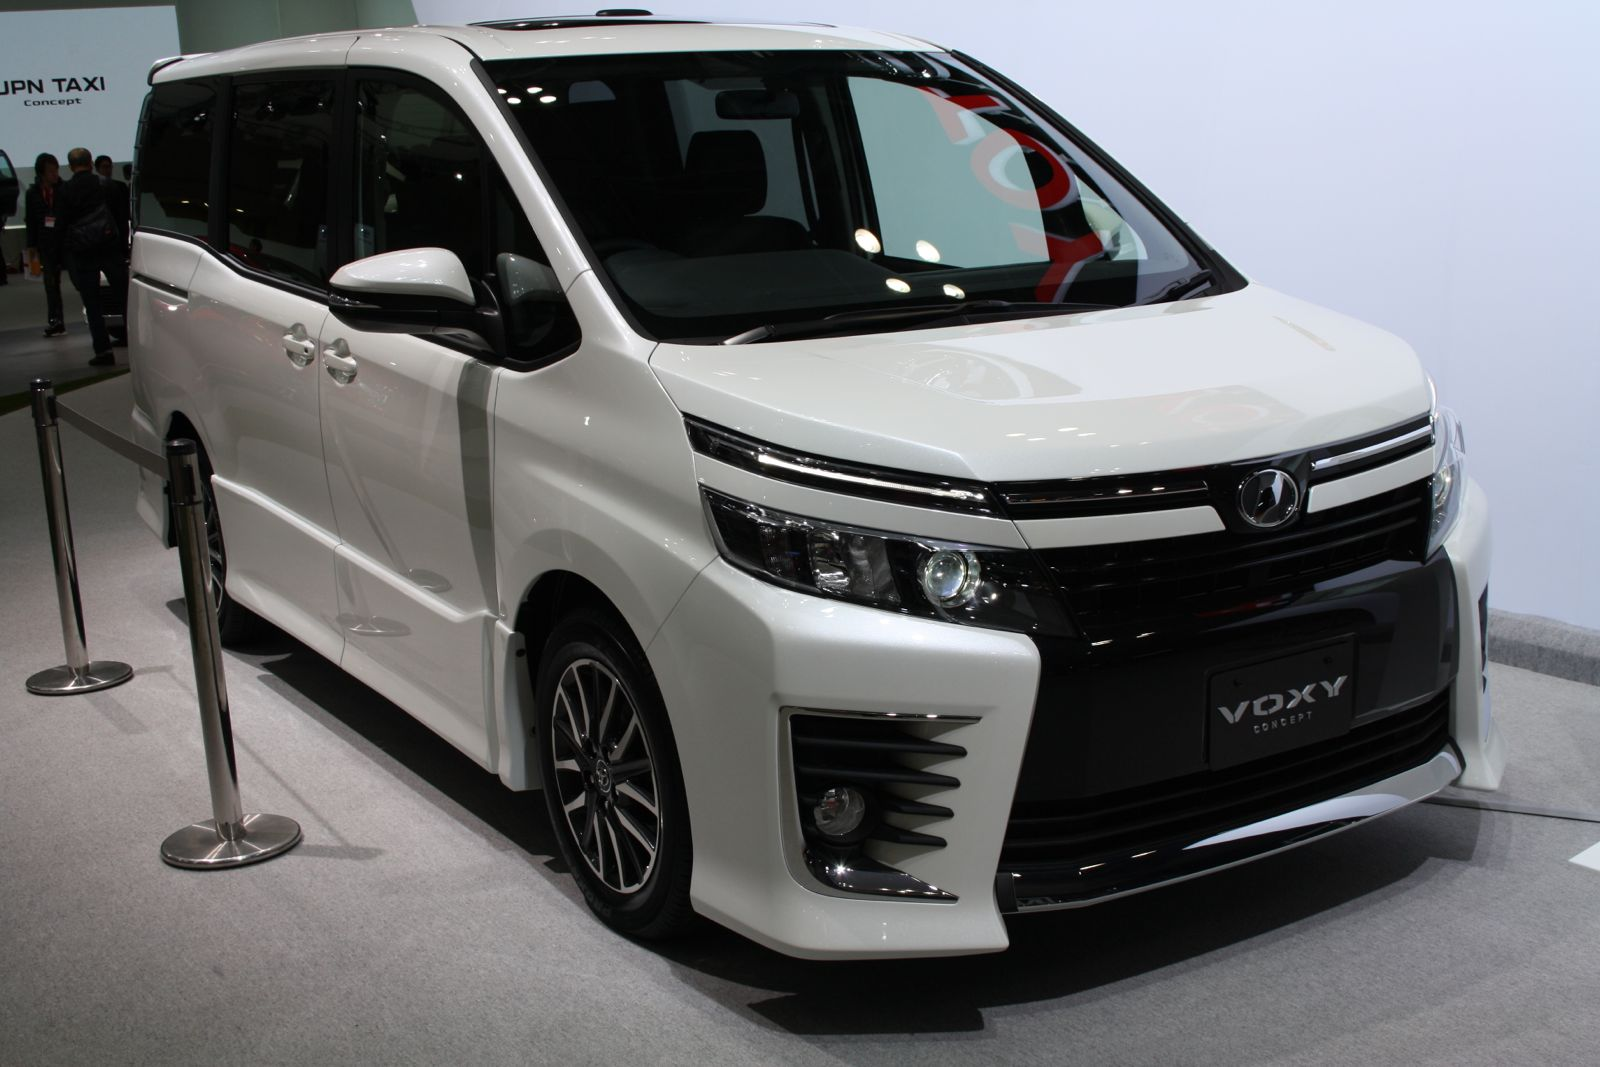 Kelebihan Mobil Voxy Review